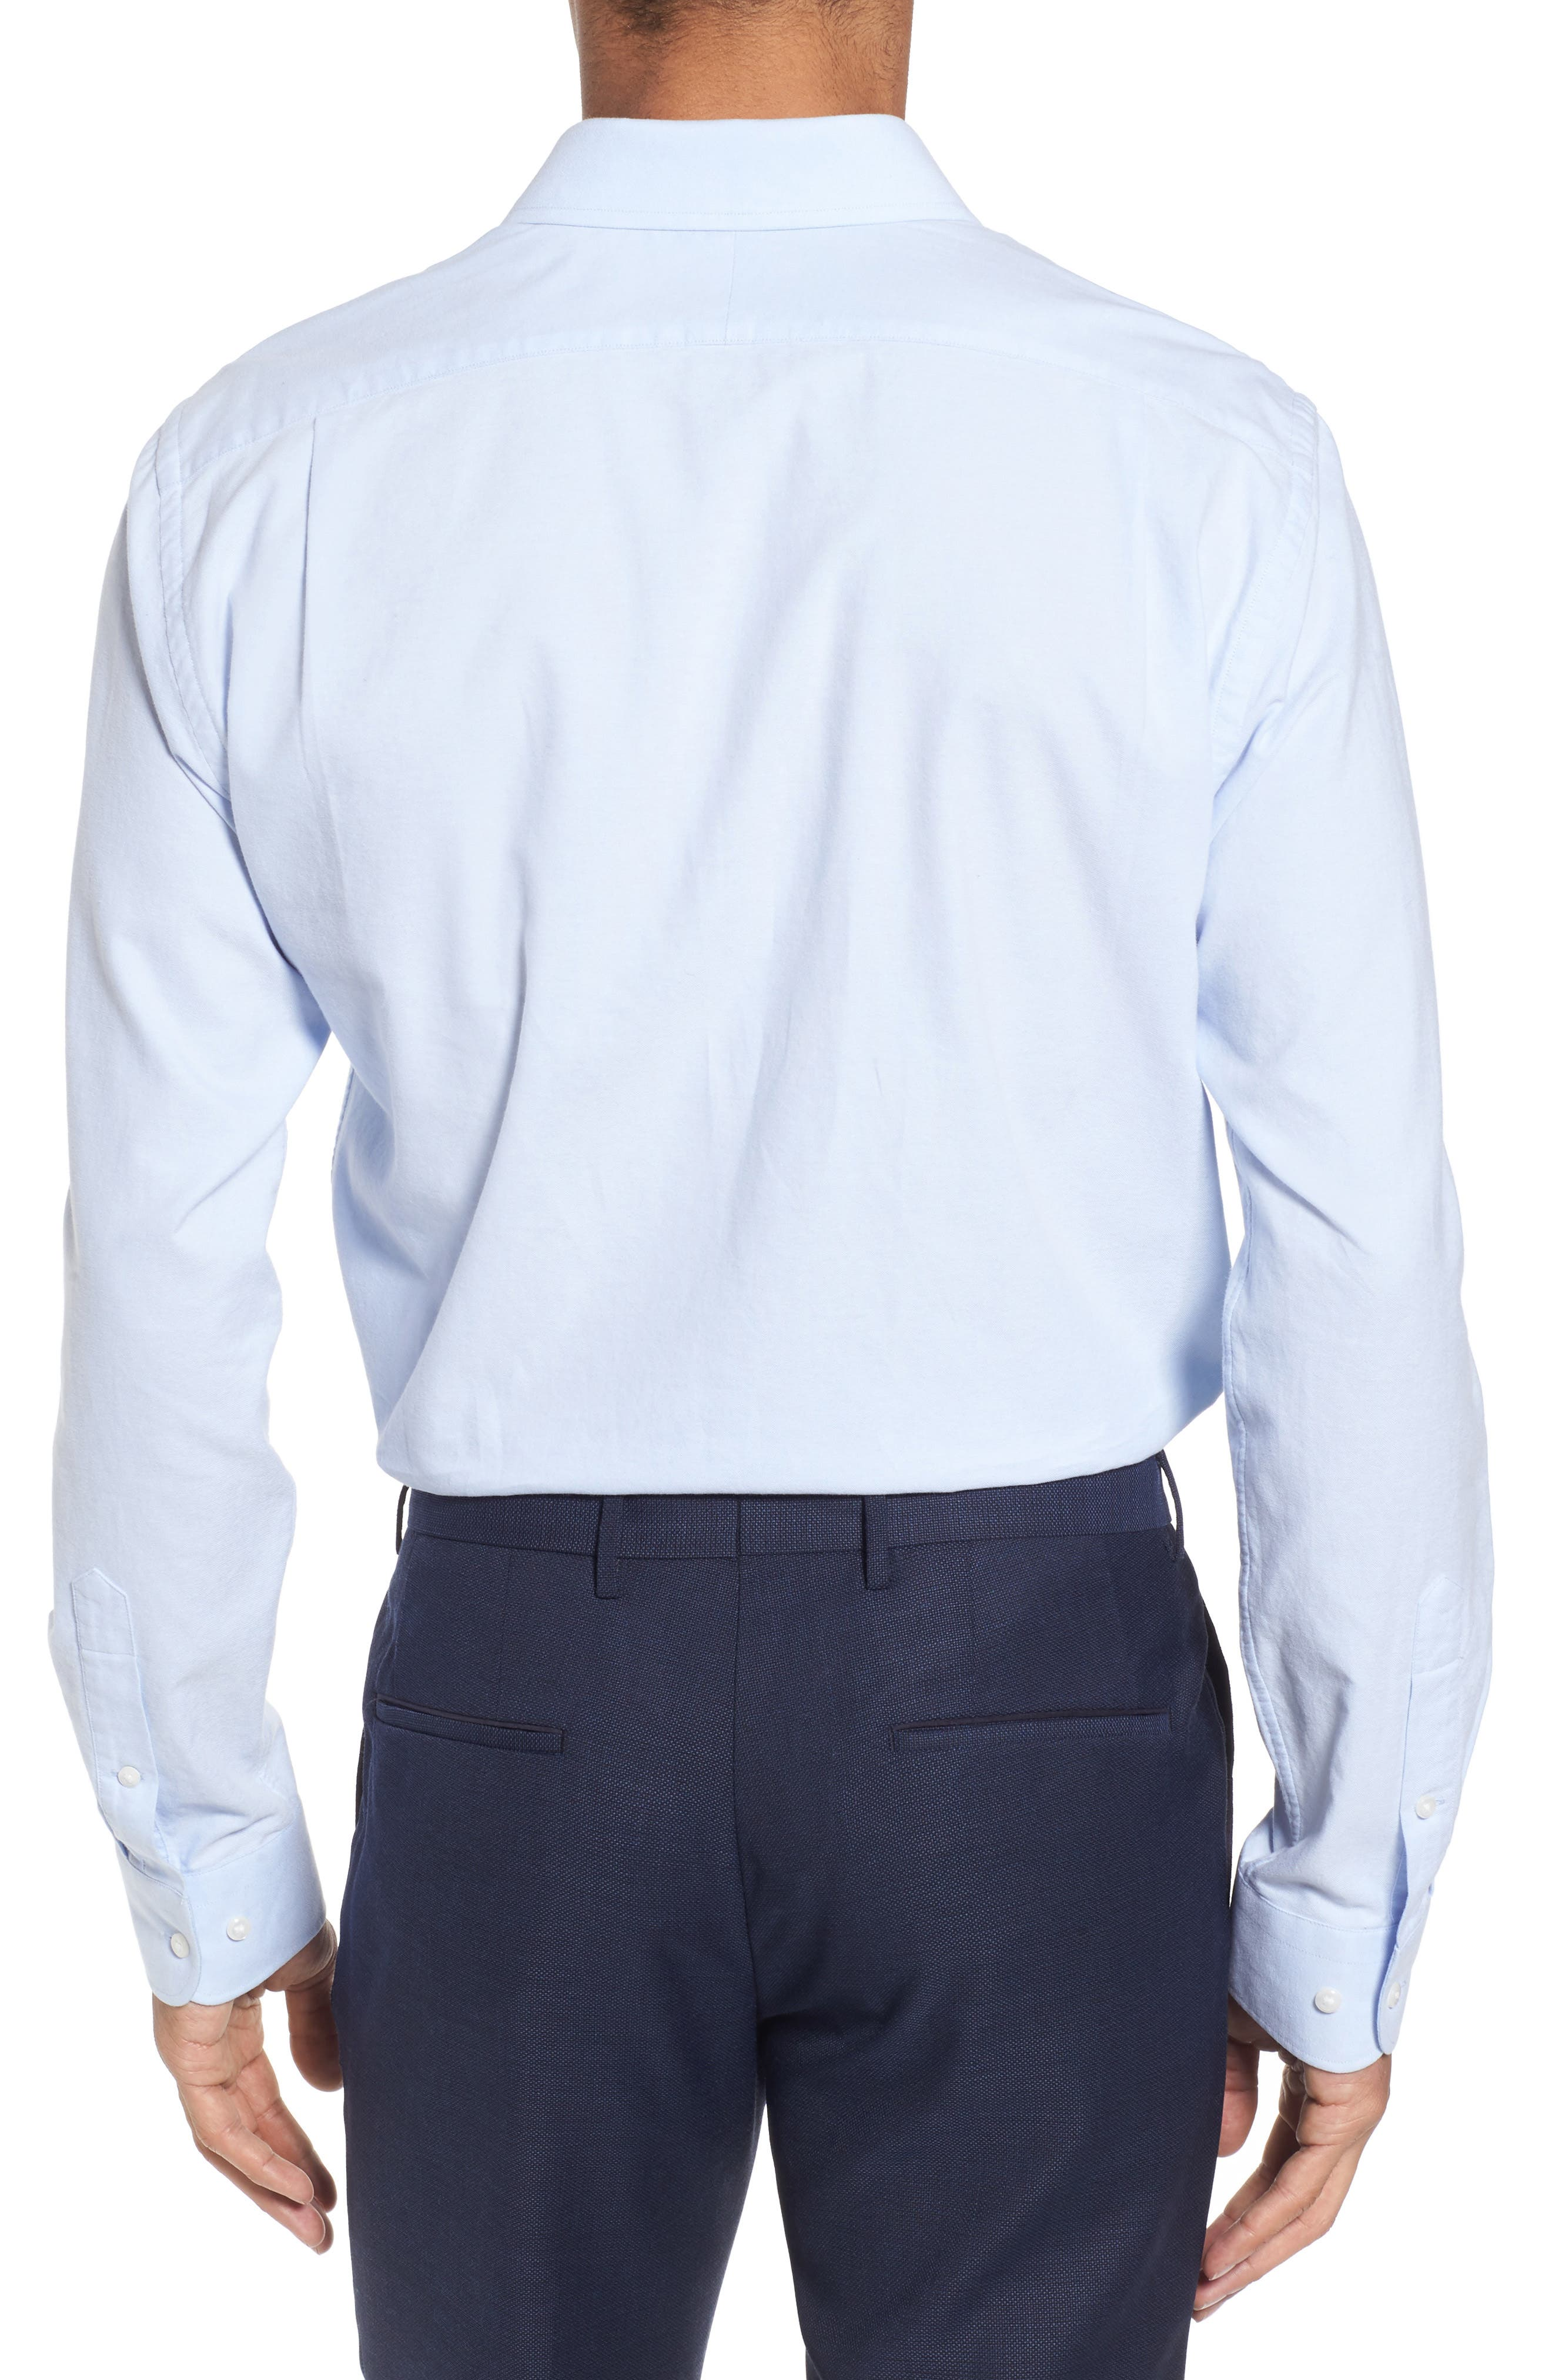 Trim Fit Patterned Dress Shirt,                             Alternate thumbnail 2, color,